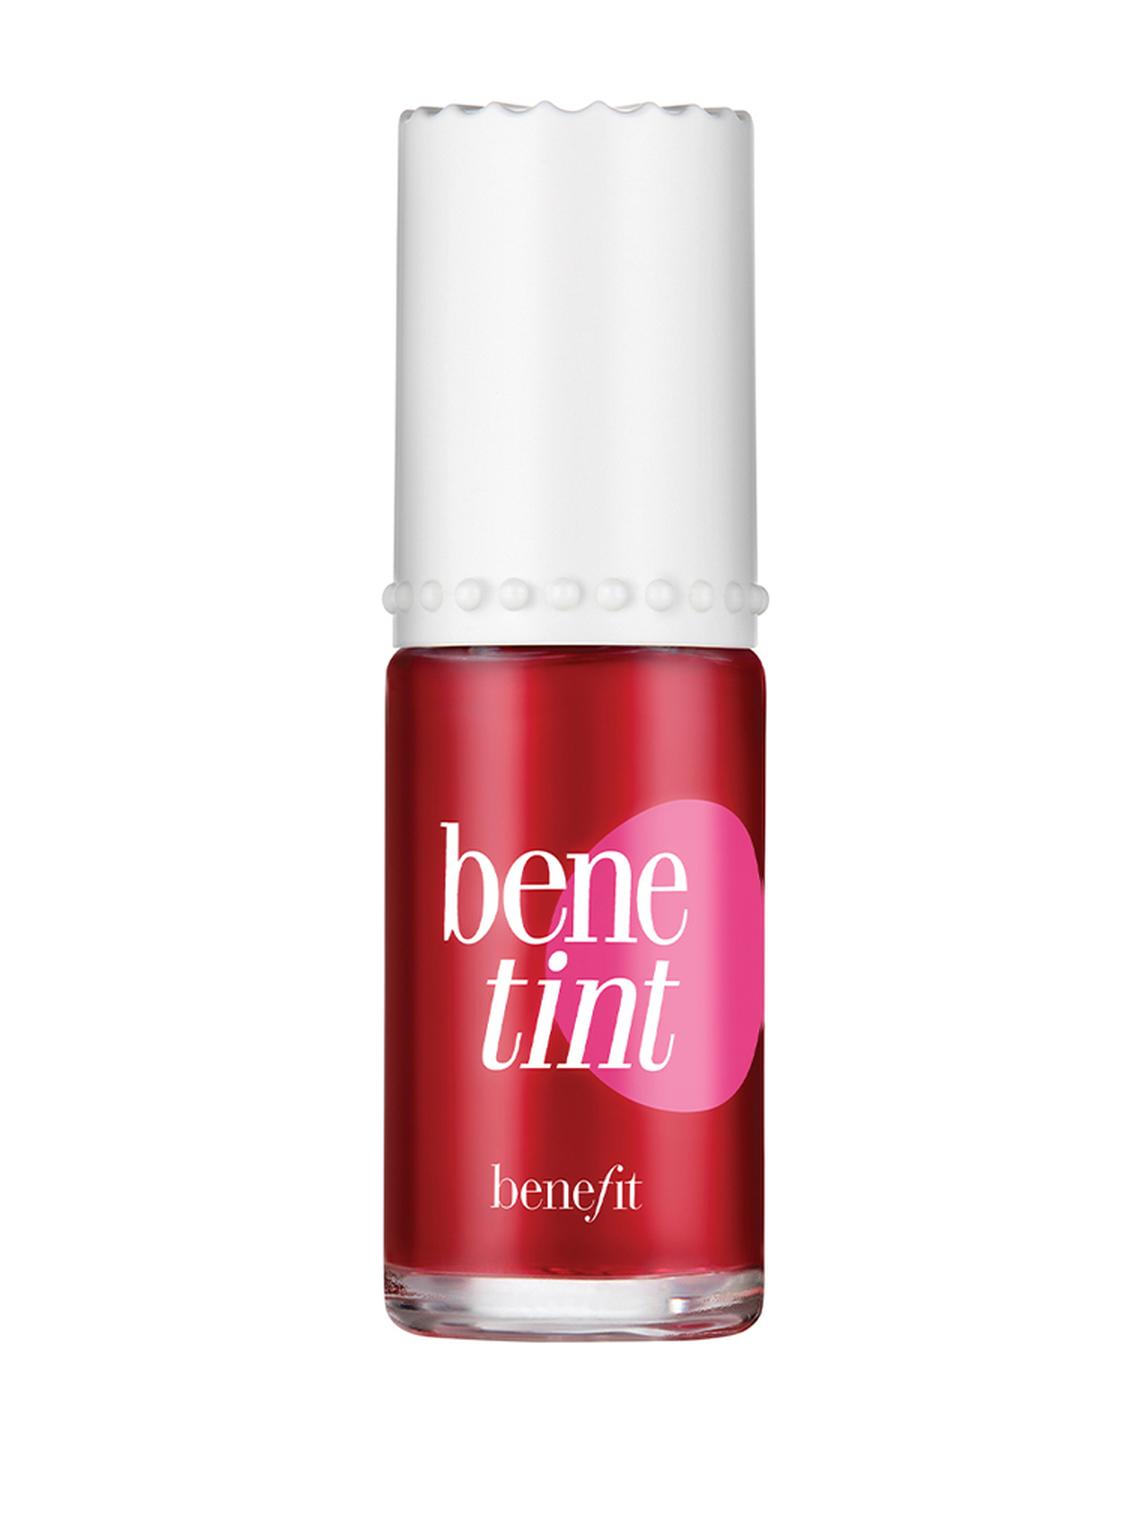 Image of Benefit Bene Tint Lippen- und Wangenfarbe 6 ml